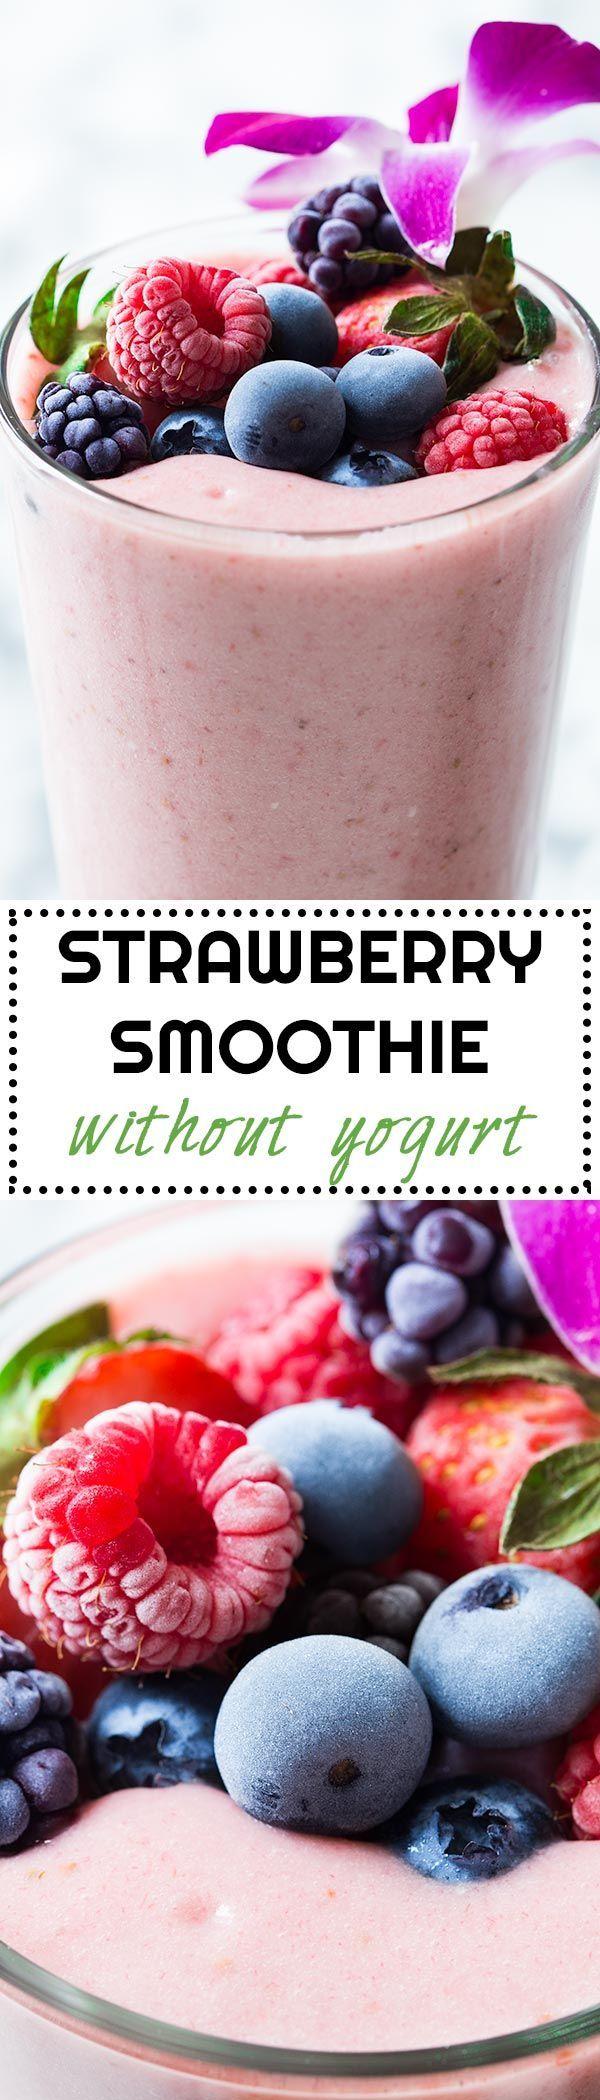 Strawberry Smoothie Without Yogurt via @greenhealthycoo